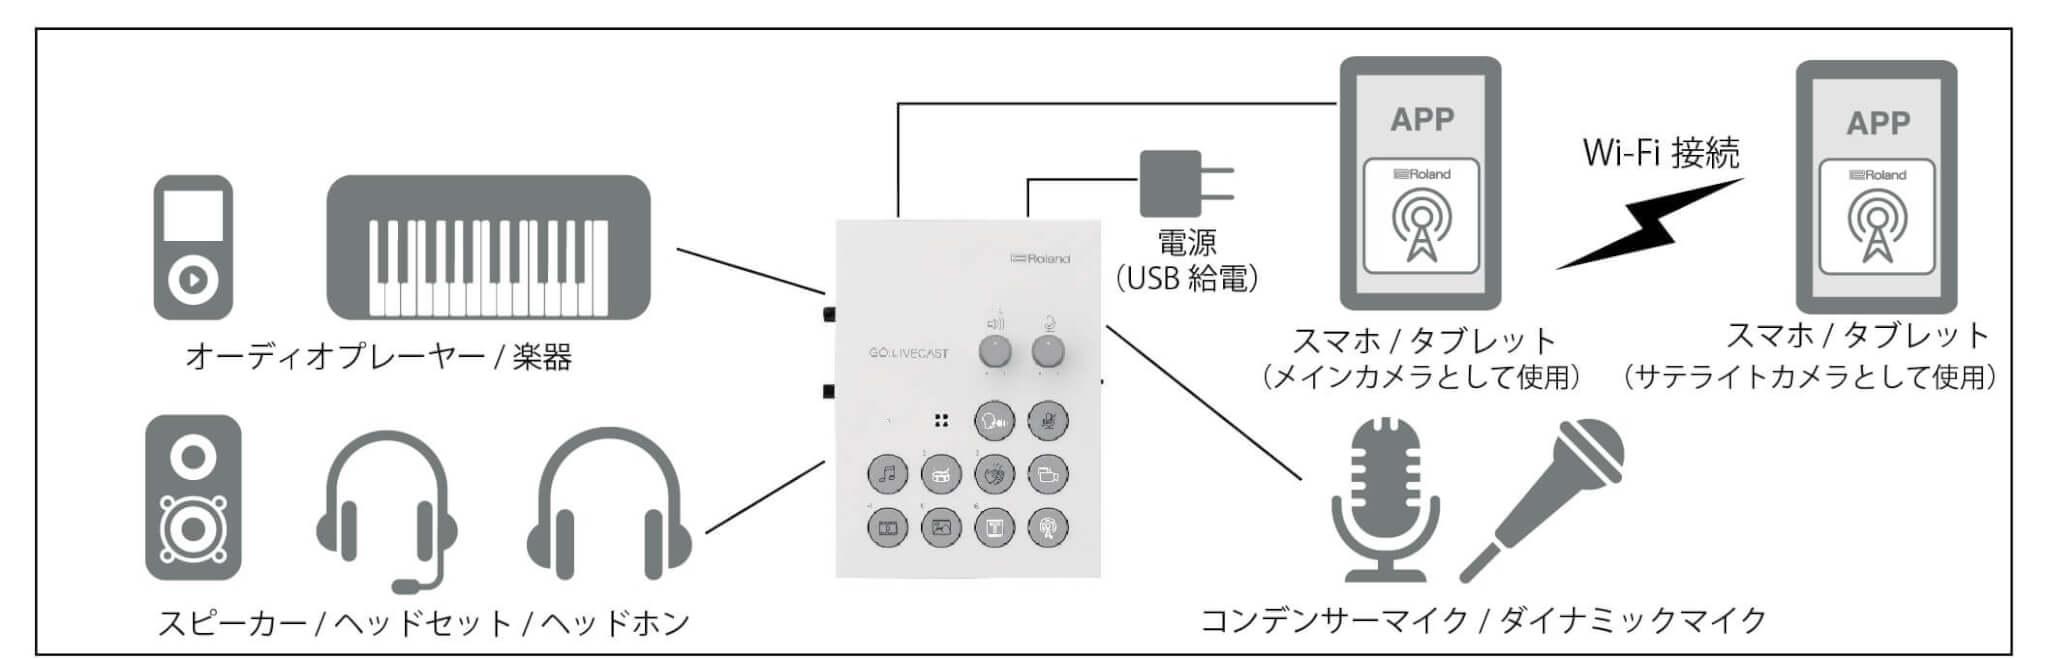 『GO:LIVECAST』の接続例